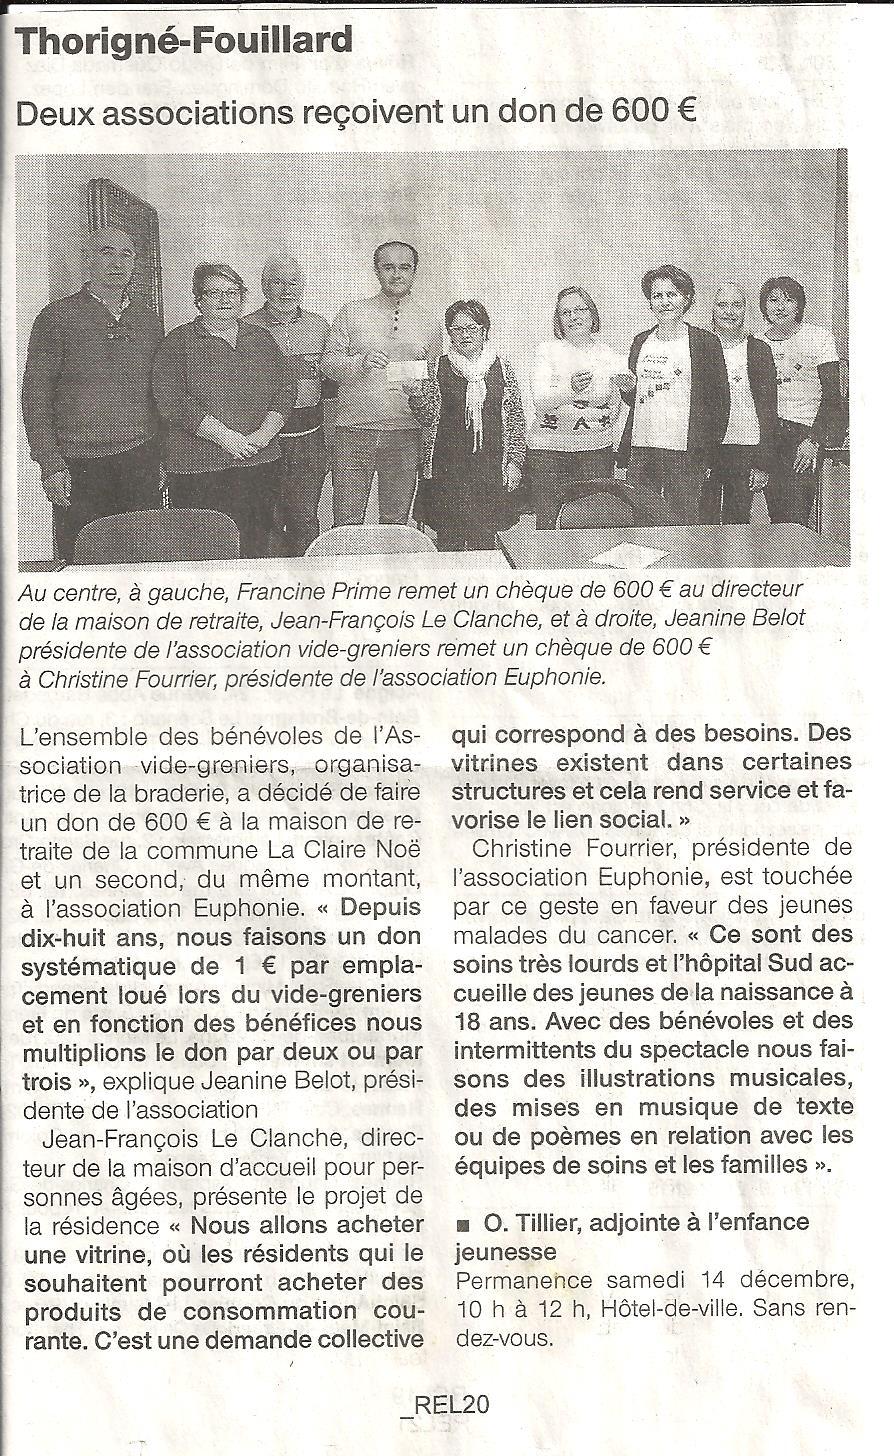 Don reçu de l'association vide-greniers de Thorigné-Fouillard